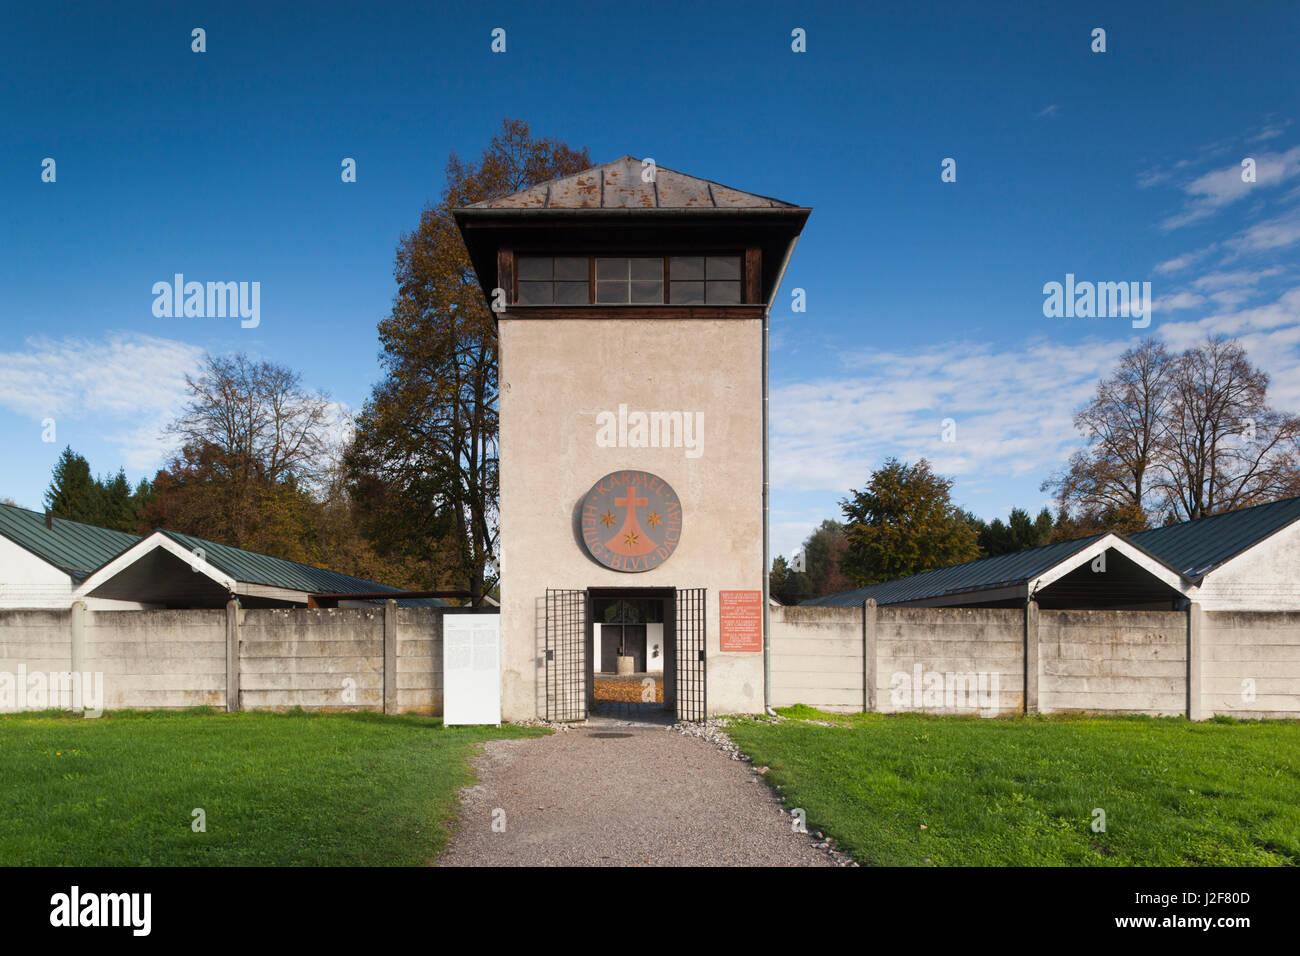 Germany, Bavaria, Munich-Dachau, WW2-era Nazi concentration camp, Carmelite Holy Blood Convent, built in 1964 - Stock Image